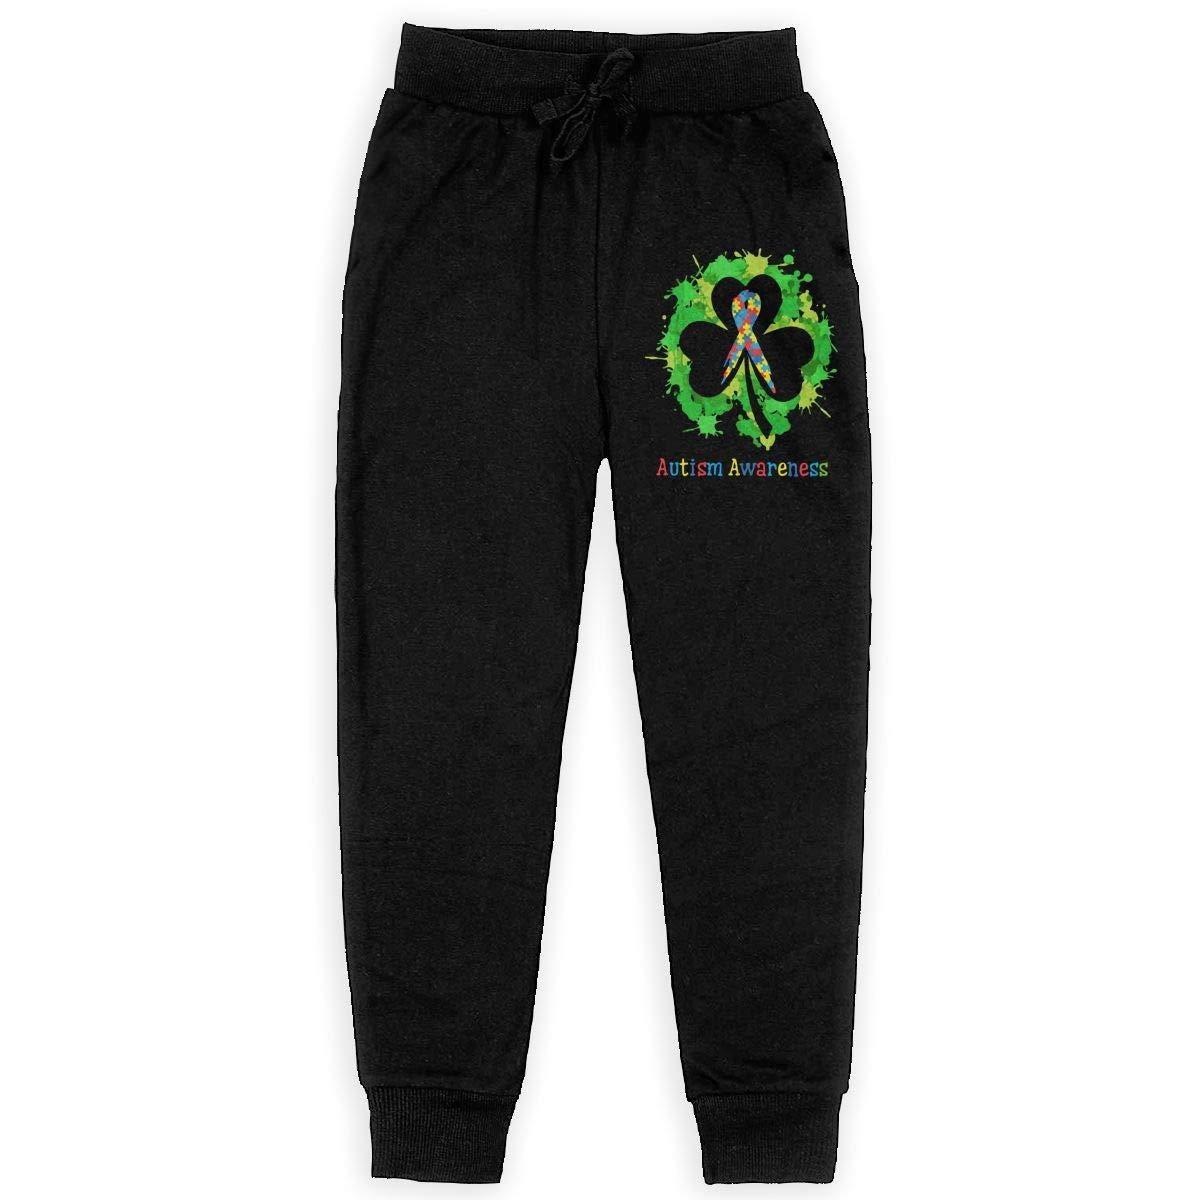 WYZVK22 Autism Awareness Soft//Cozy Sweatpants Teenager Sweat Pant for Teen Boy